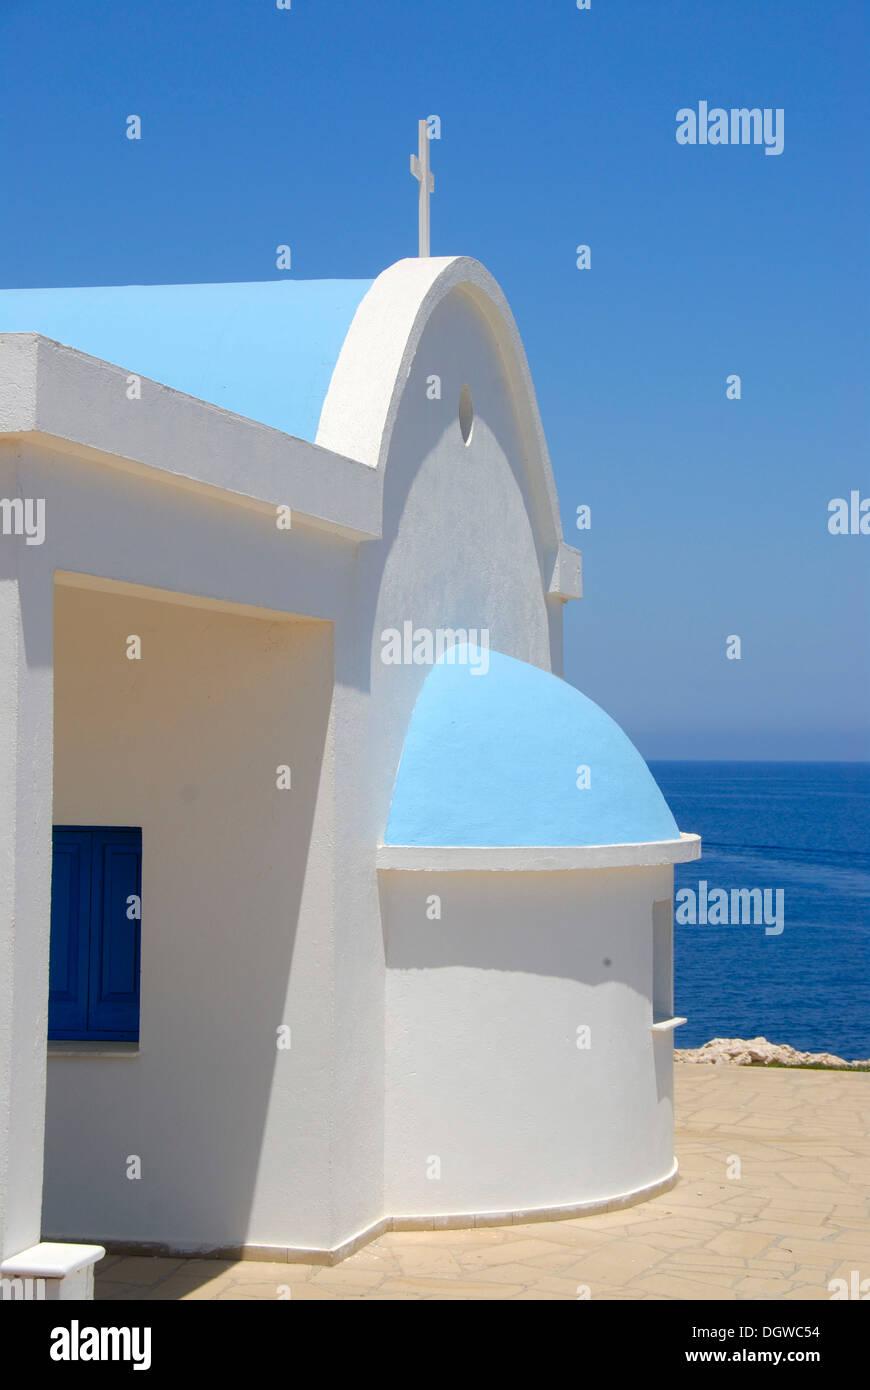 Greek Orthodox Christianity, Church of Ayioi Anargyri, Agioi Anargyroi, chapel, blue sea, Cape Greco, near Ayia Napa - Stock Image